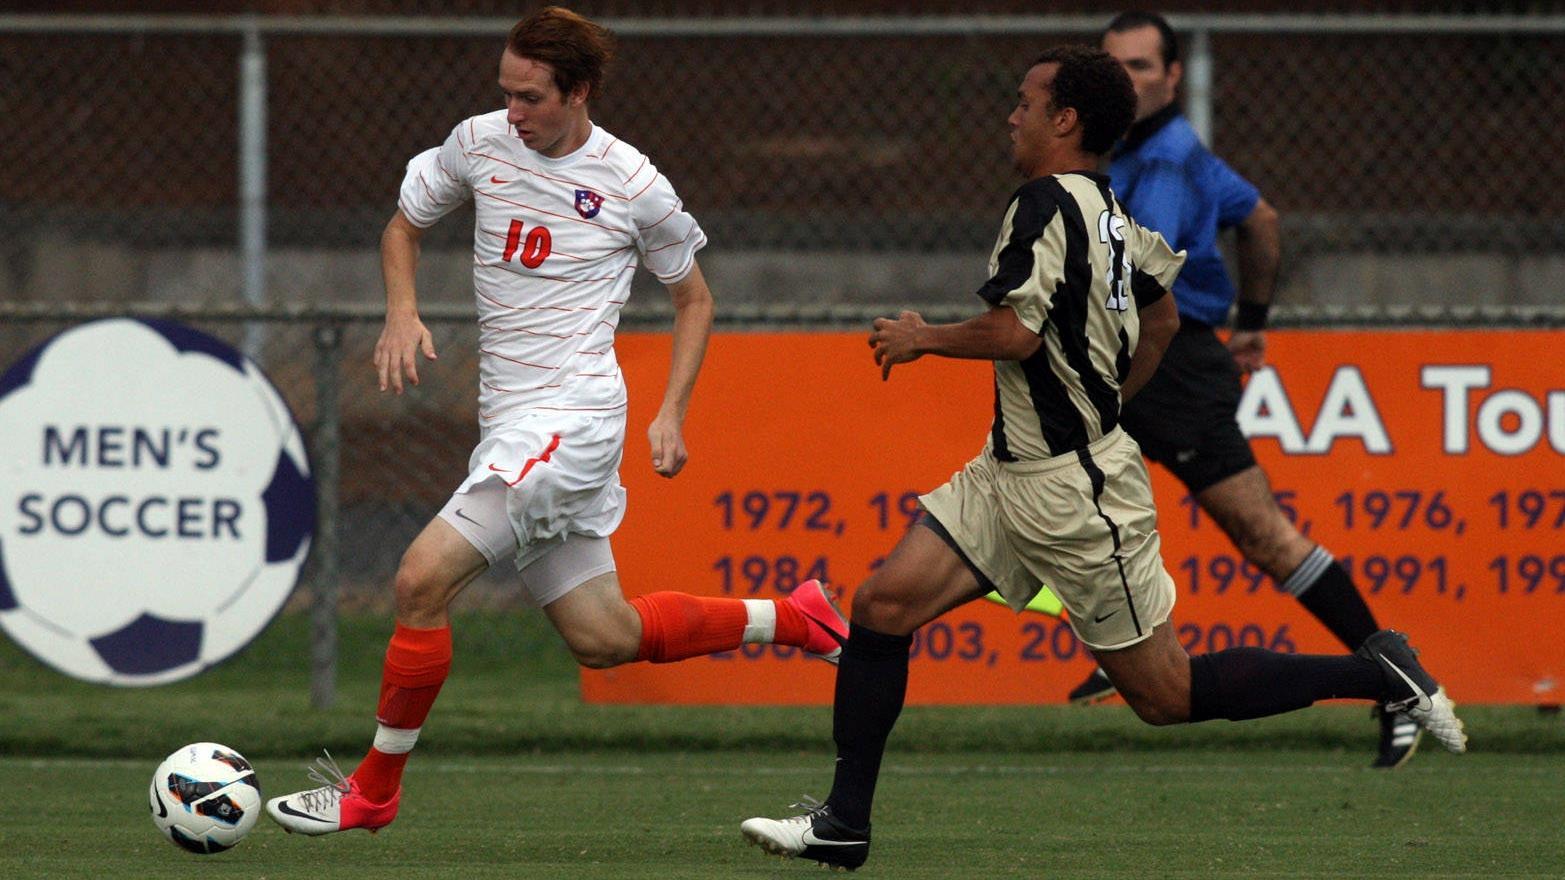 Wofford Defeats Clemson 3-1 in Men's Soccer Exhibition in Regulation